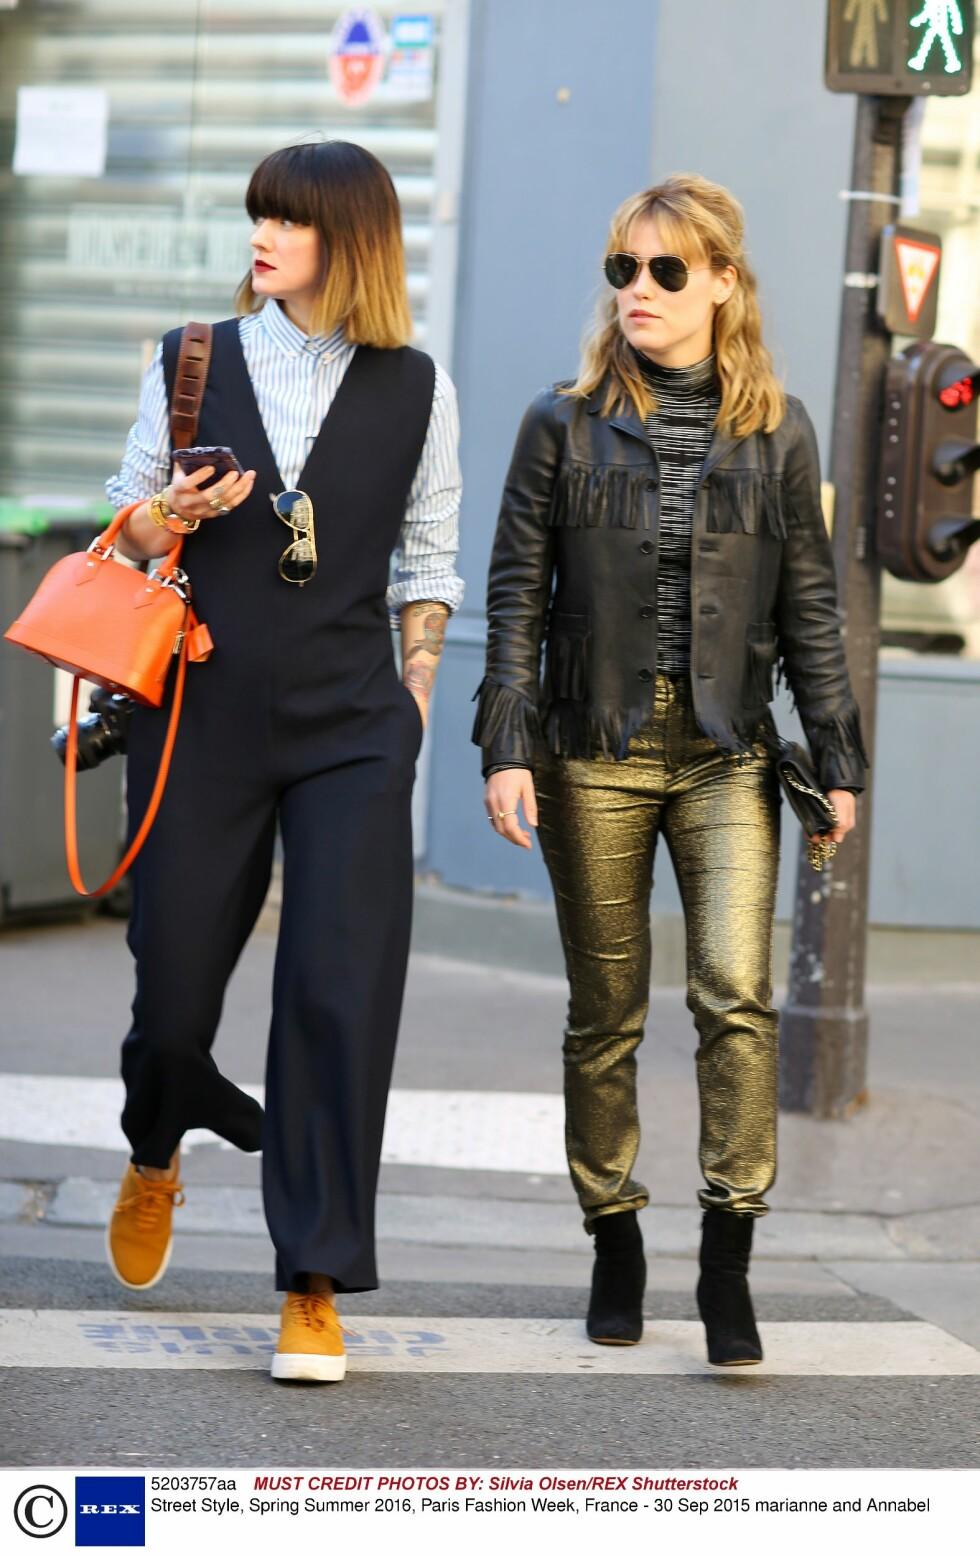 PARIS: Norske Marianne Theodorsen og Annabel Rosendahl. Foto: Rex Features